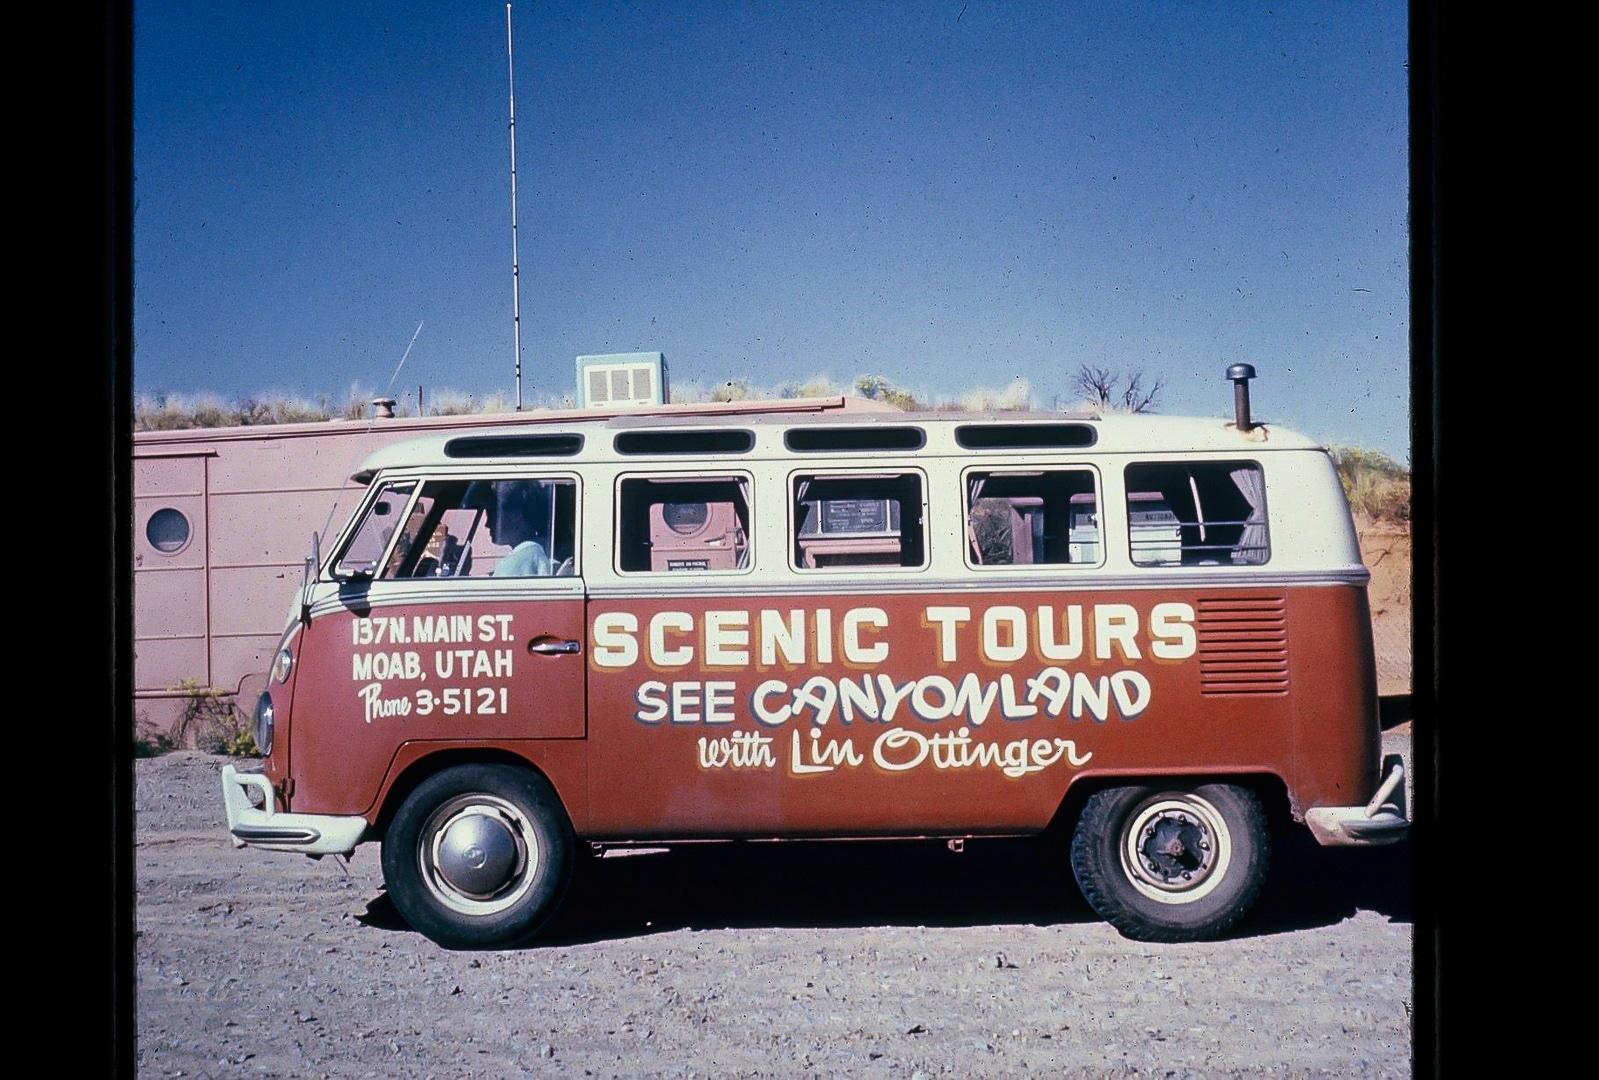 Lin Ottinger Canyon Land Scenic Tour VW Bus - BeCombi - Une-3